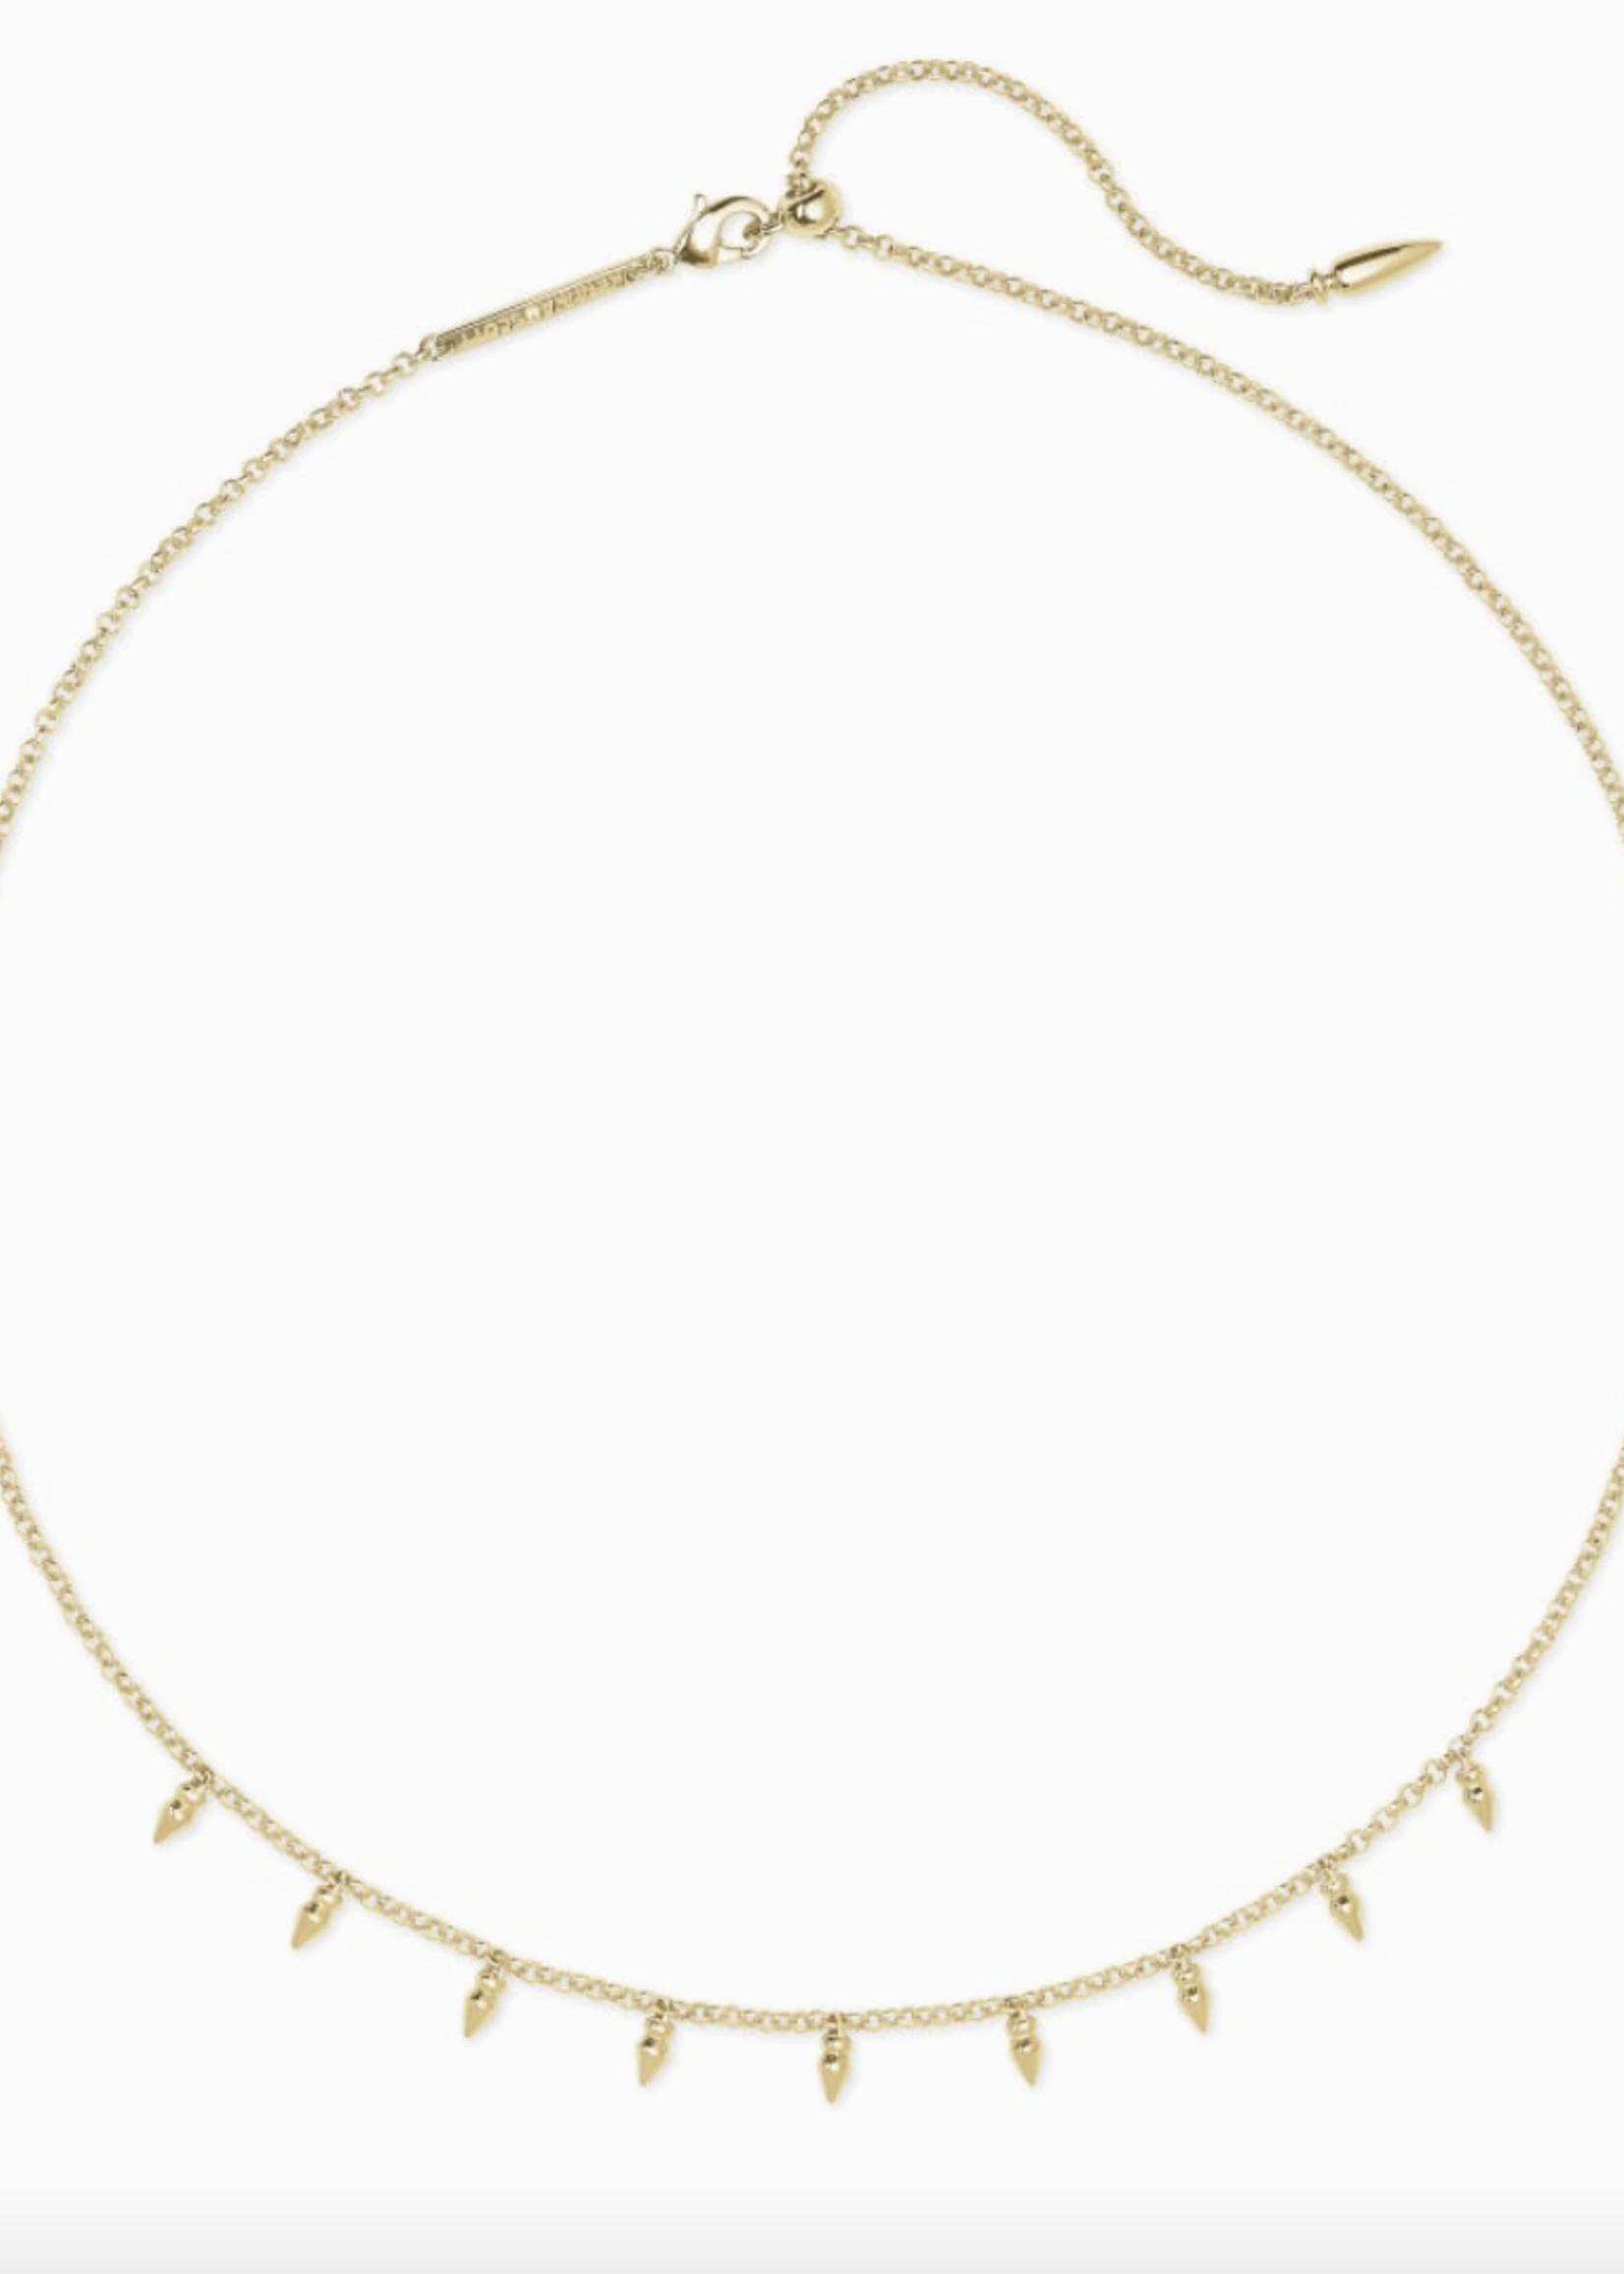 Kendra Scott Kendra Scott Addison Necklace Gold